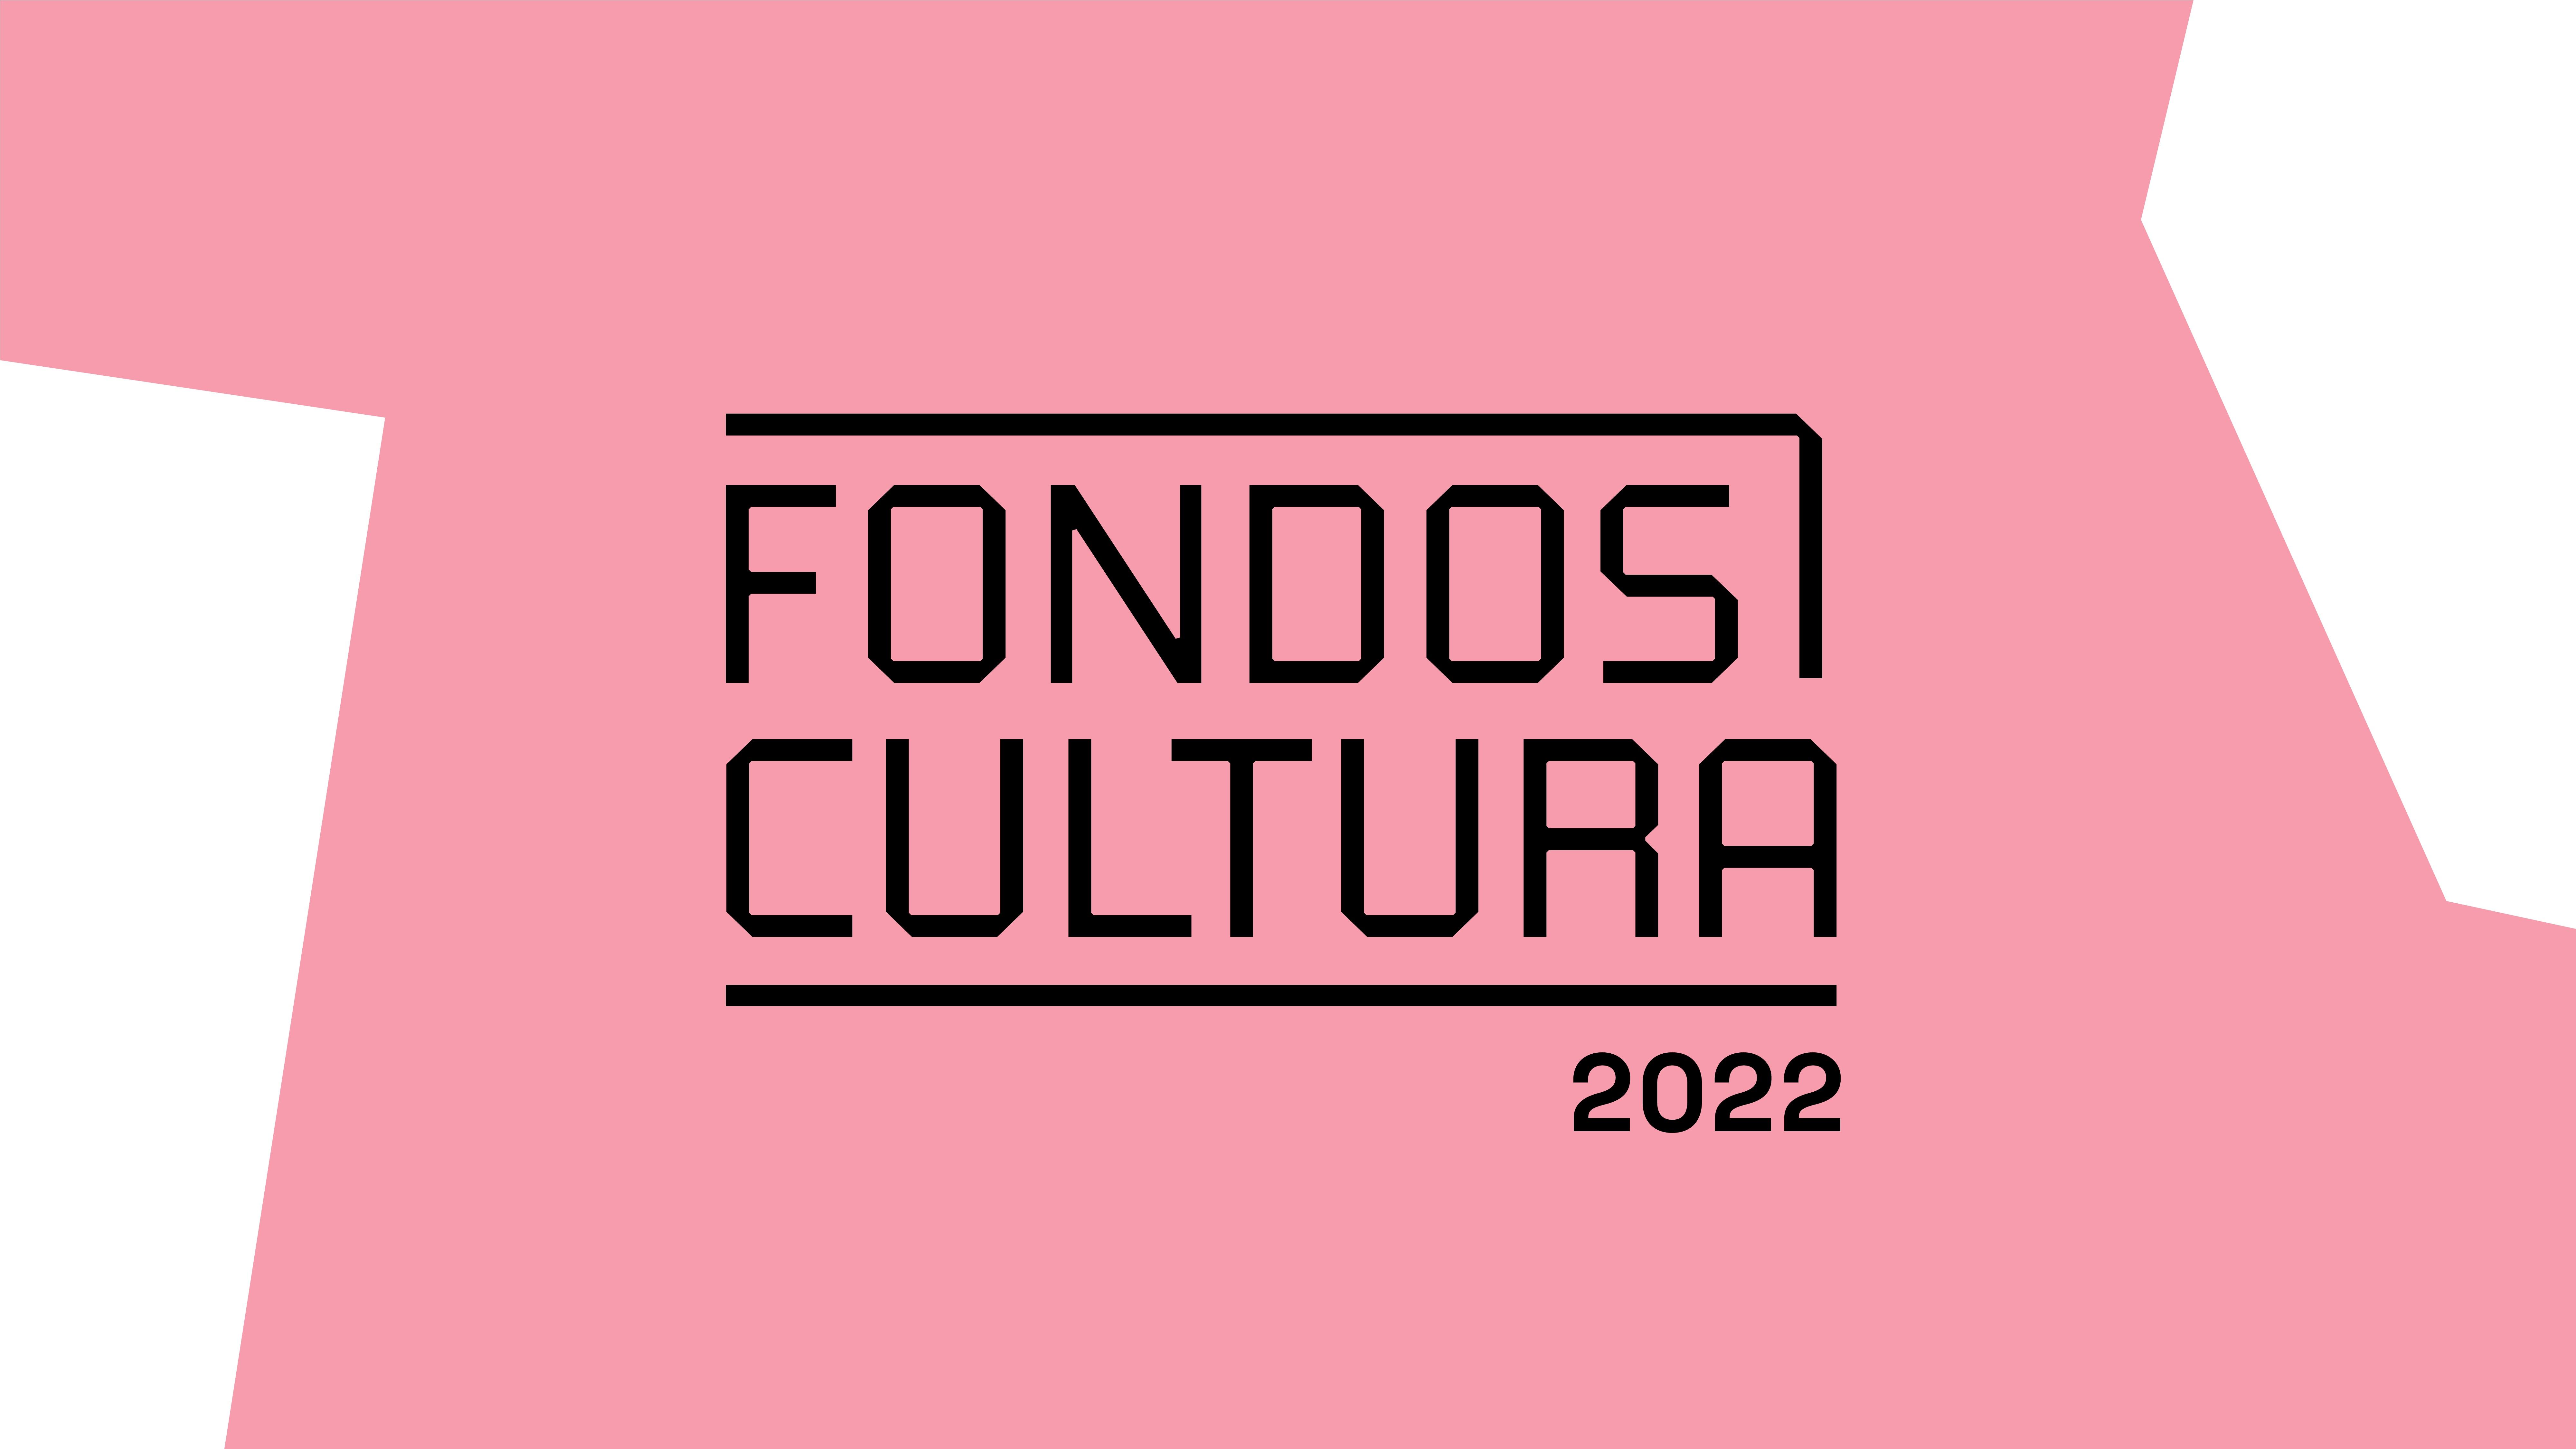 FondosCultura2022